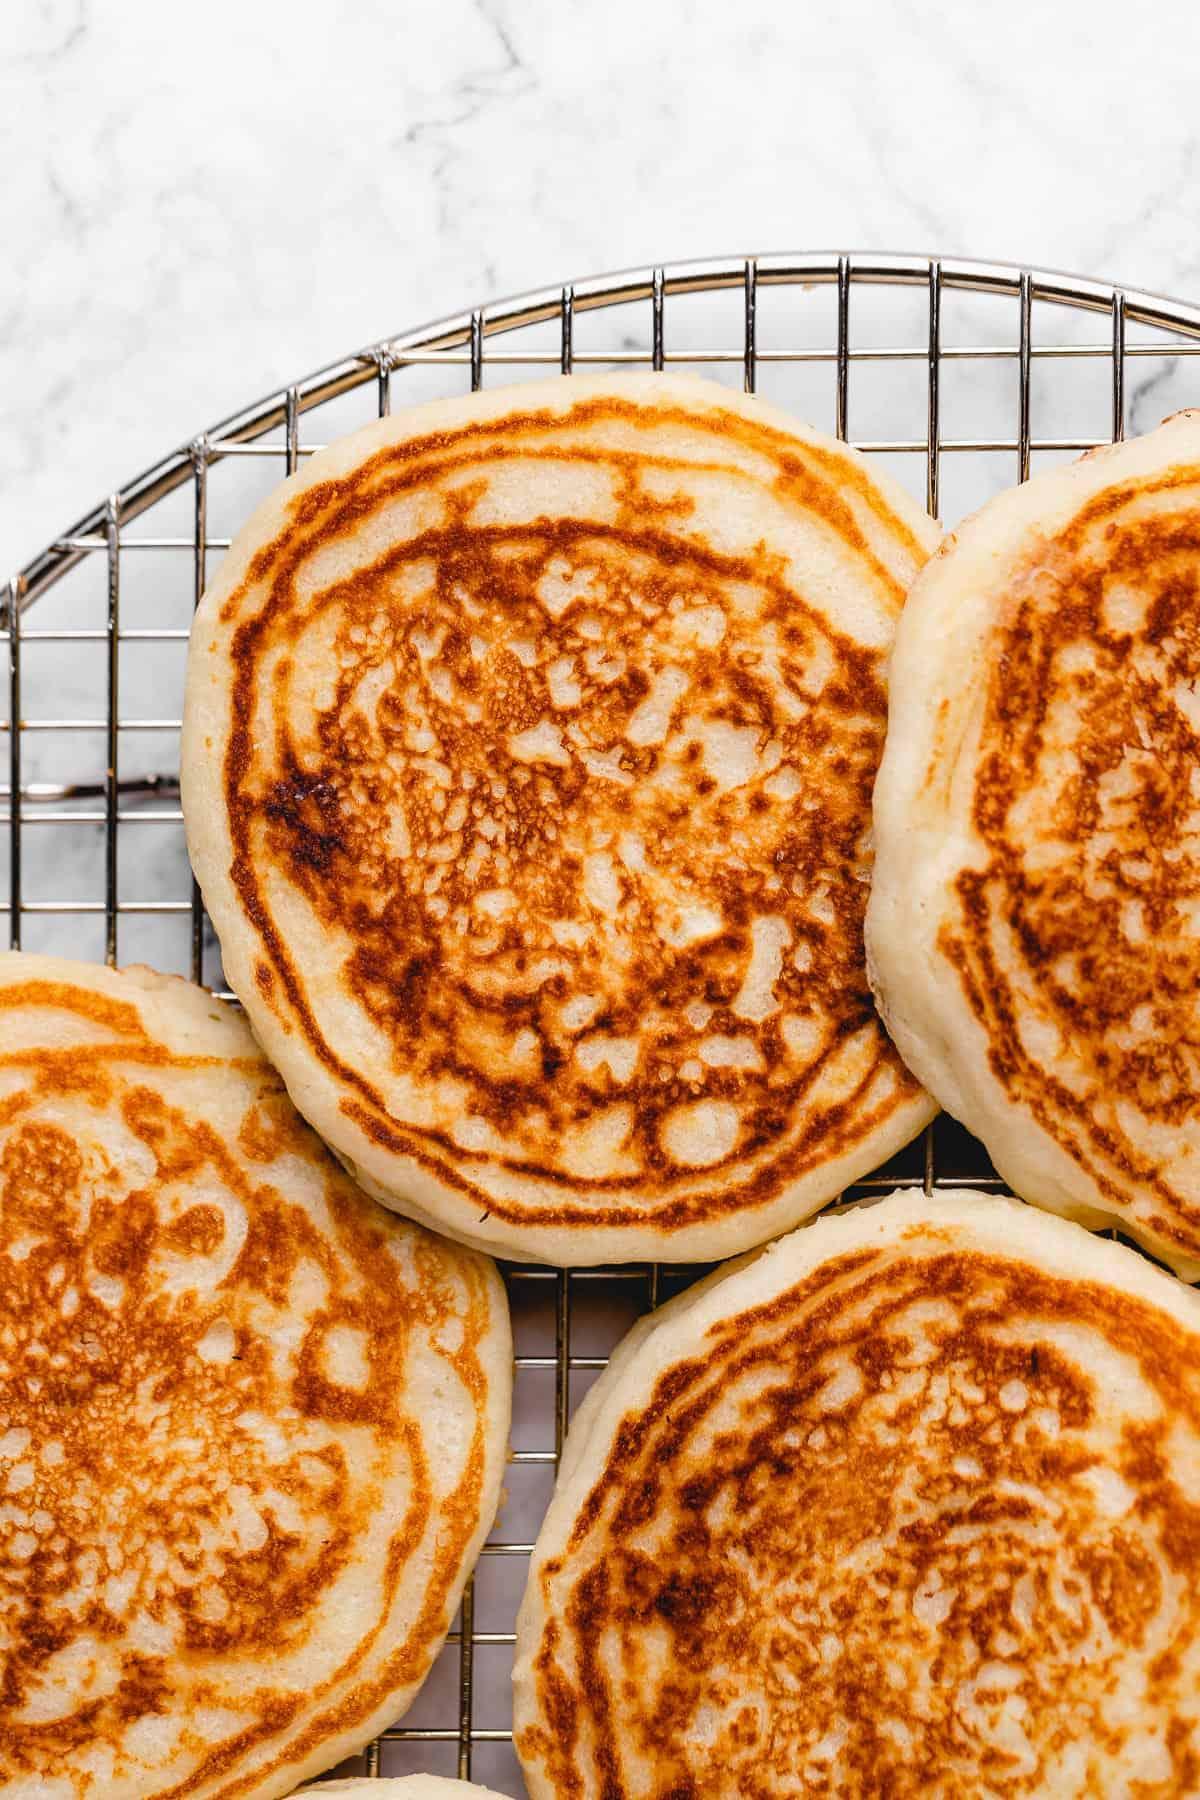 Cooling rack of crispy vegan pancakes.